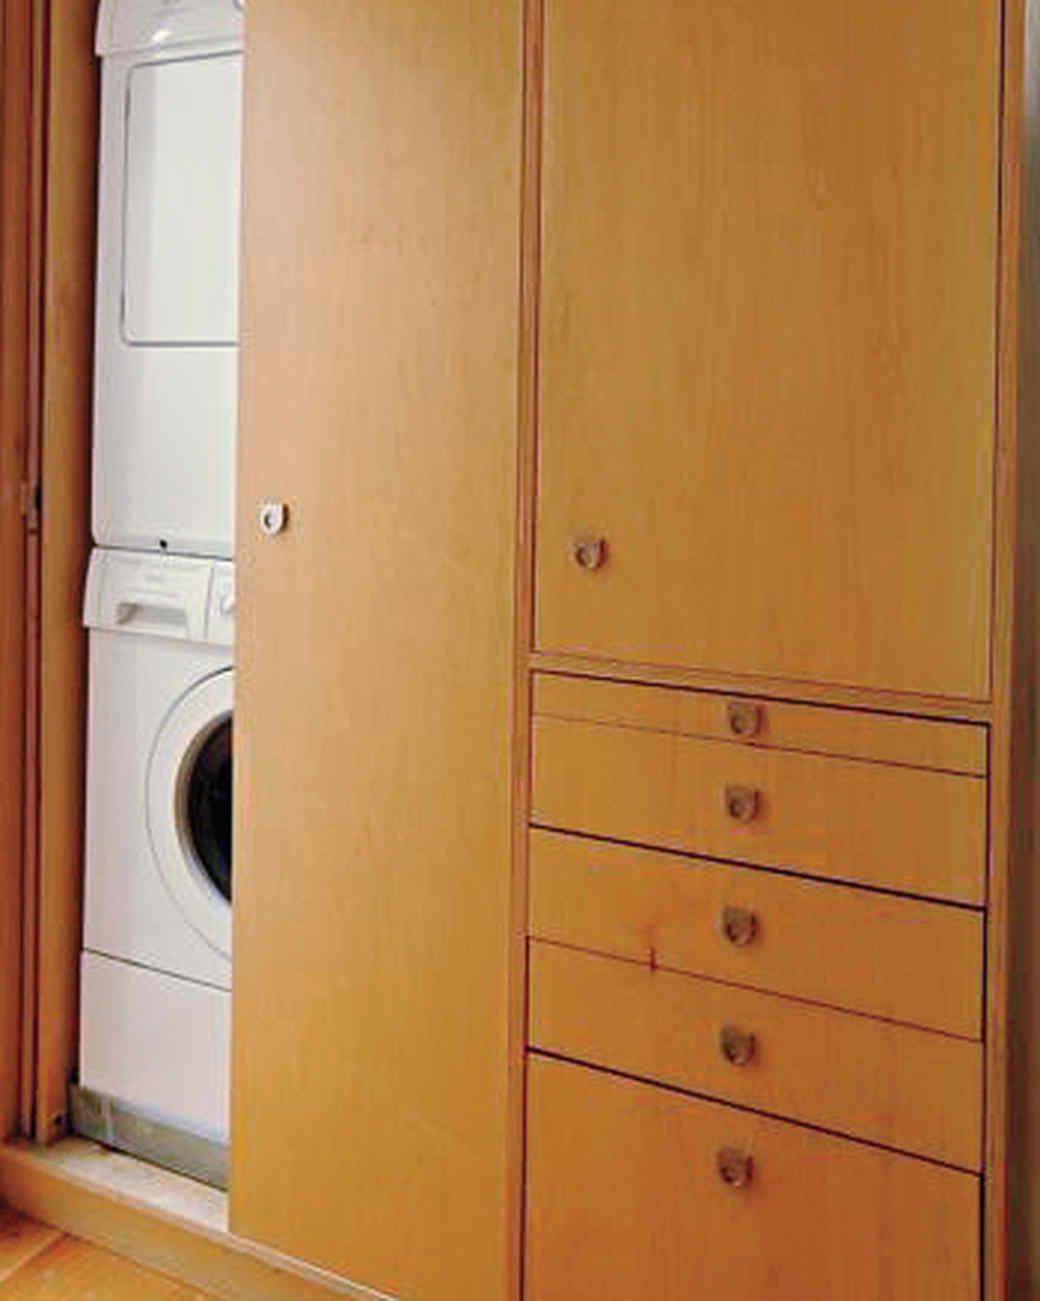 washer-dryer-cabinet-13l-ms110496.jpg